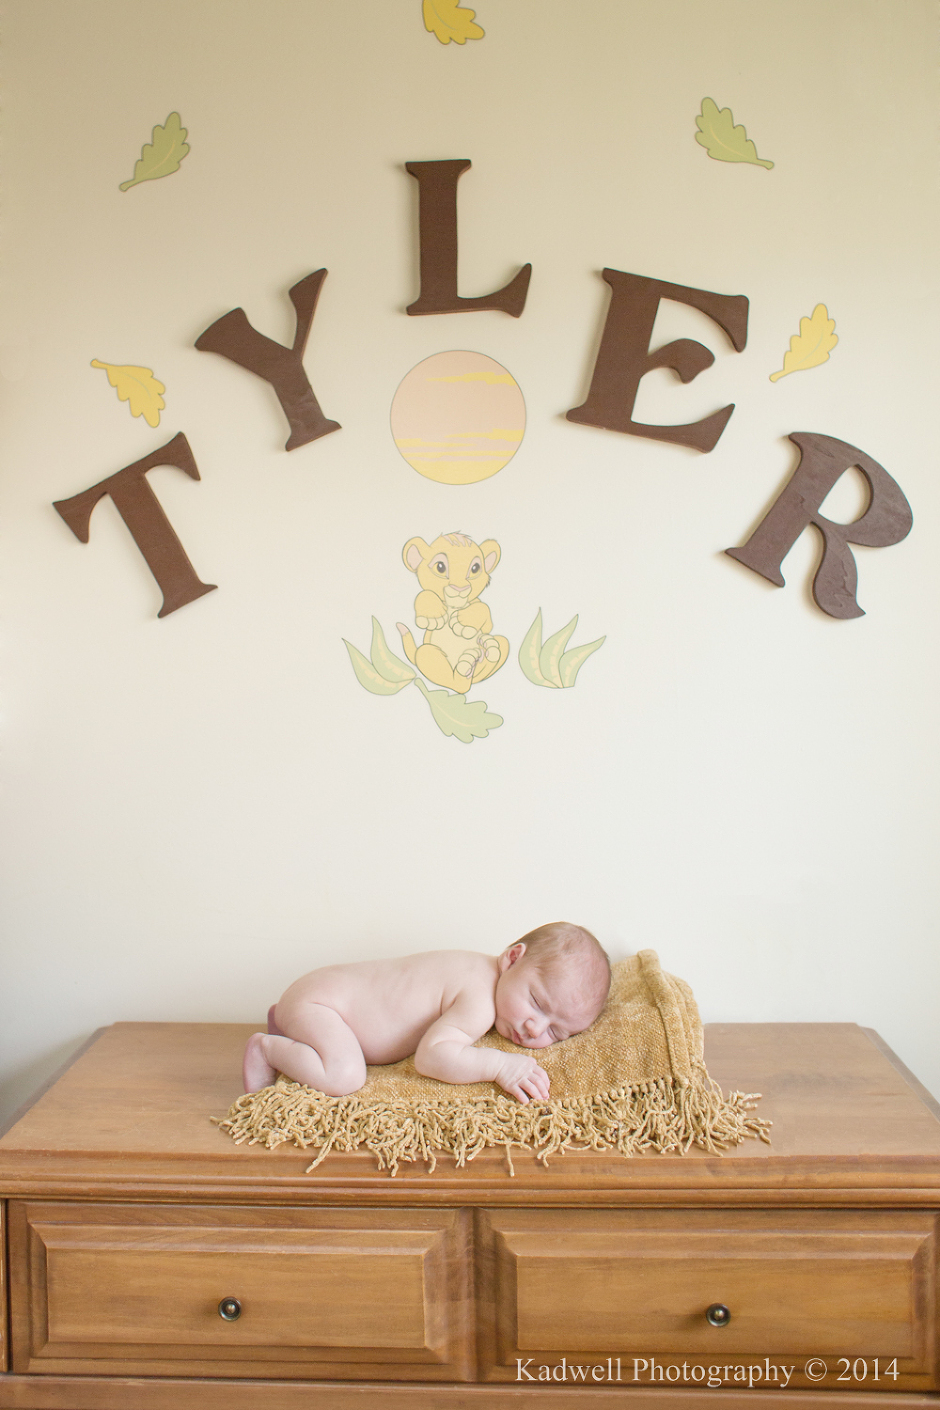 tyler_newborn (6 of 16)